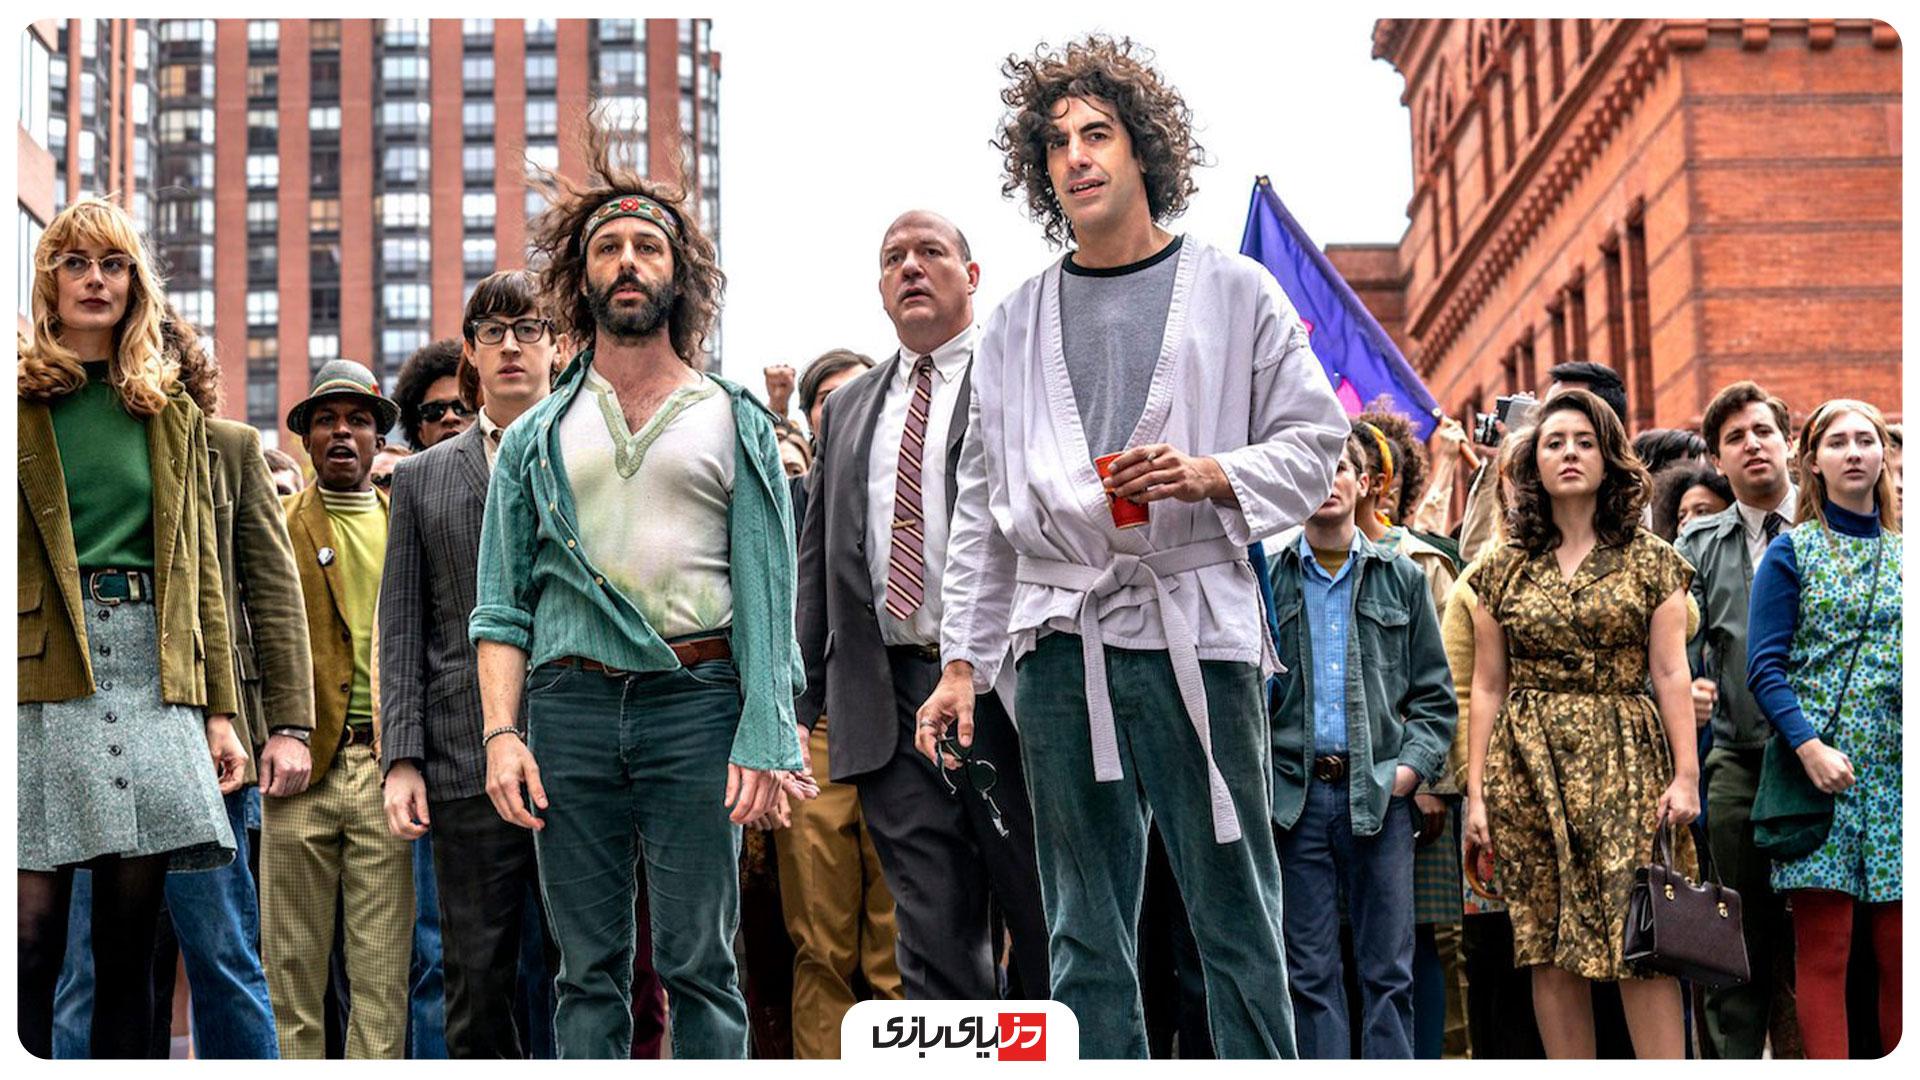 فیلم The Trial of Chicago 7